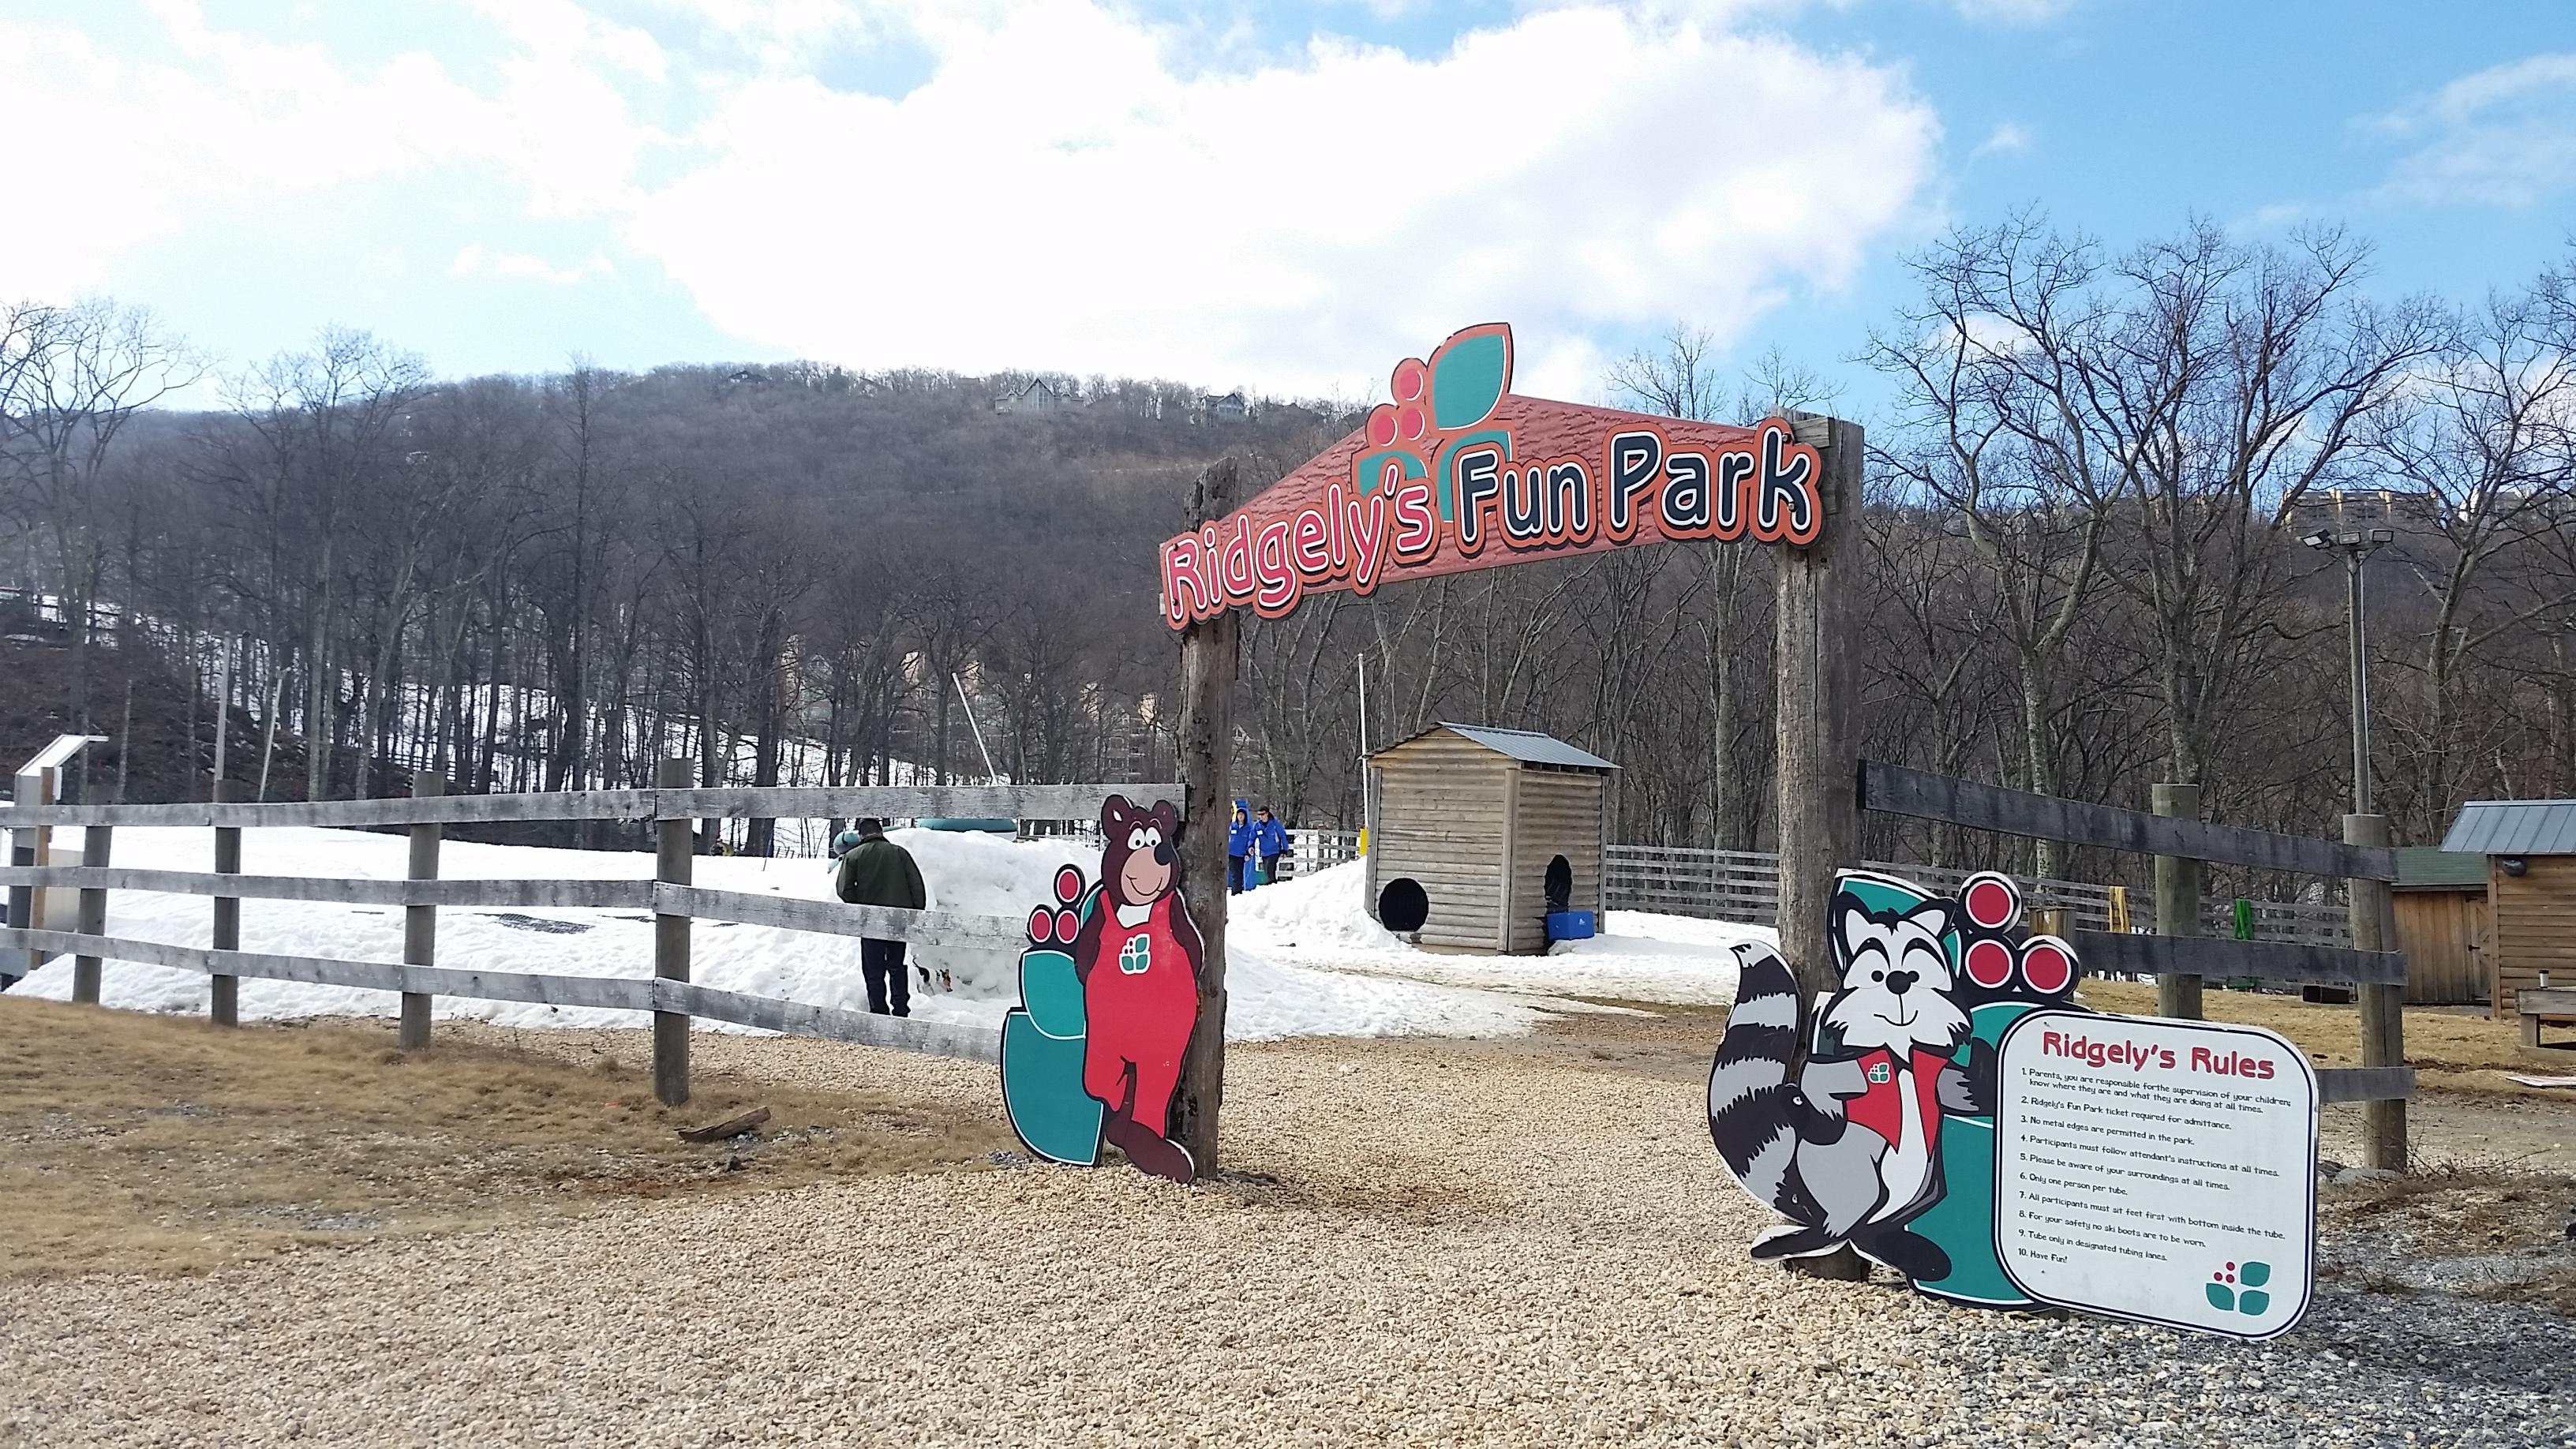 Ridgely's Fun Park kiddie area at Wintergreen Resort in Virginia